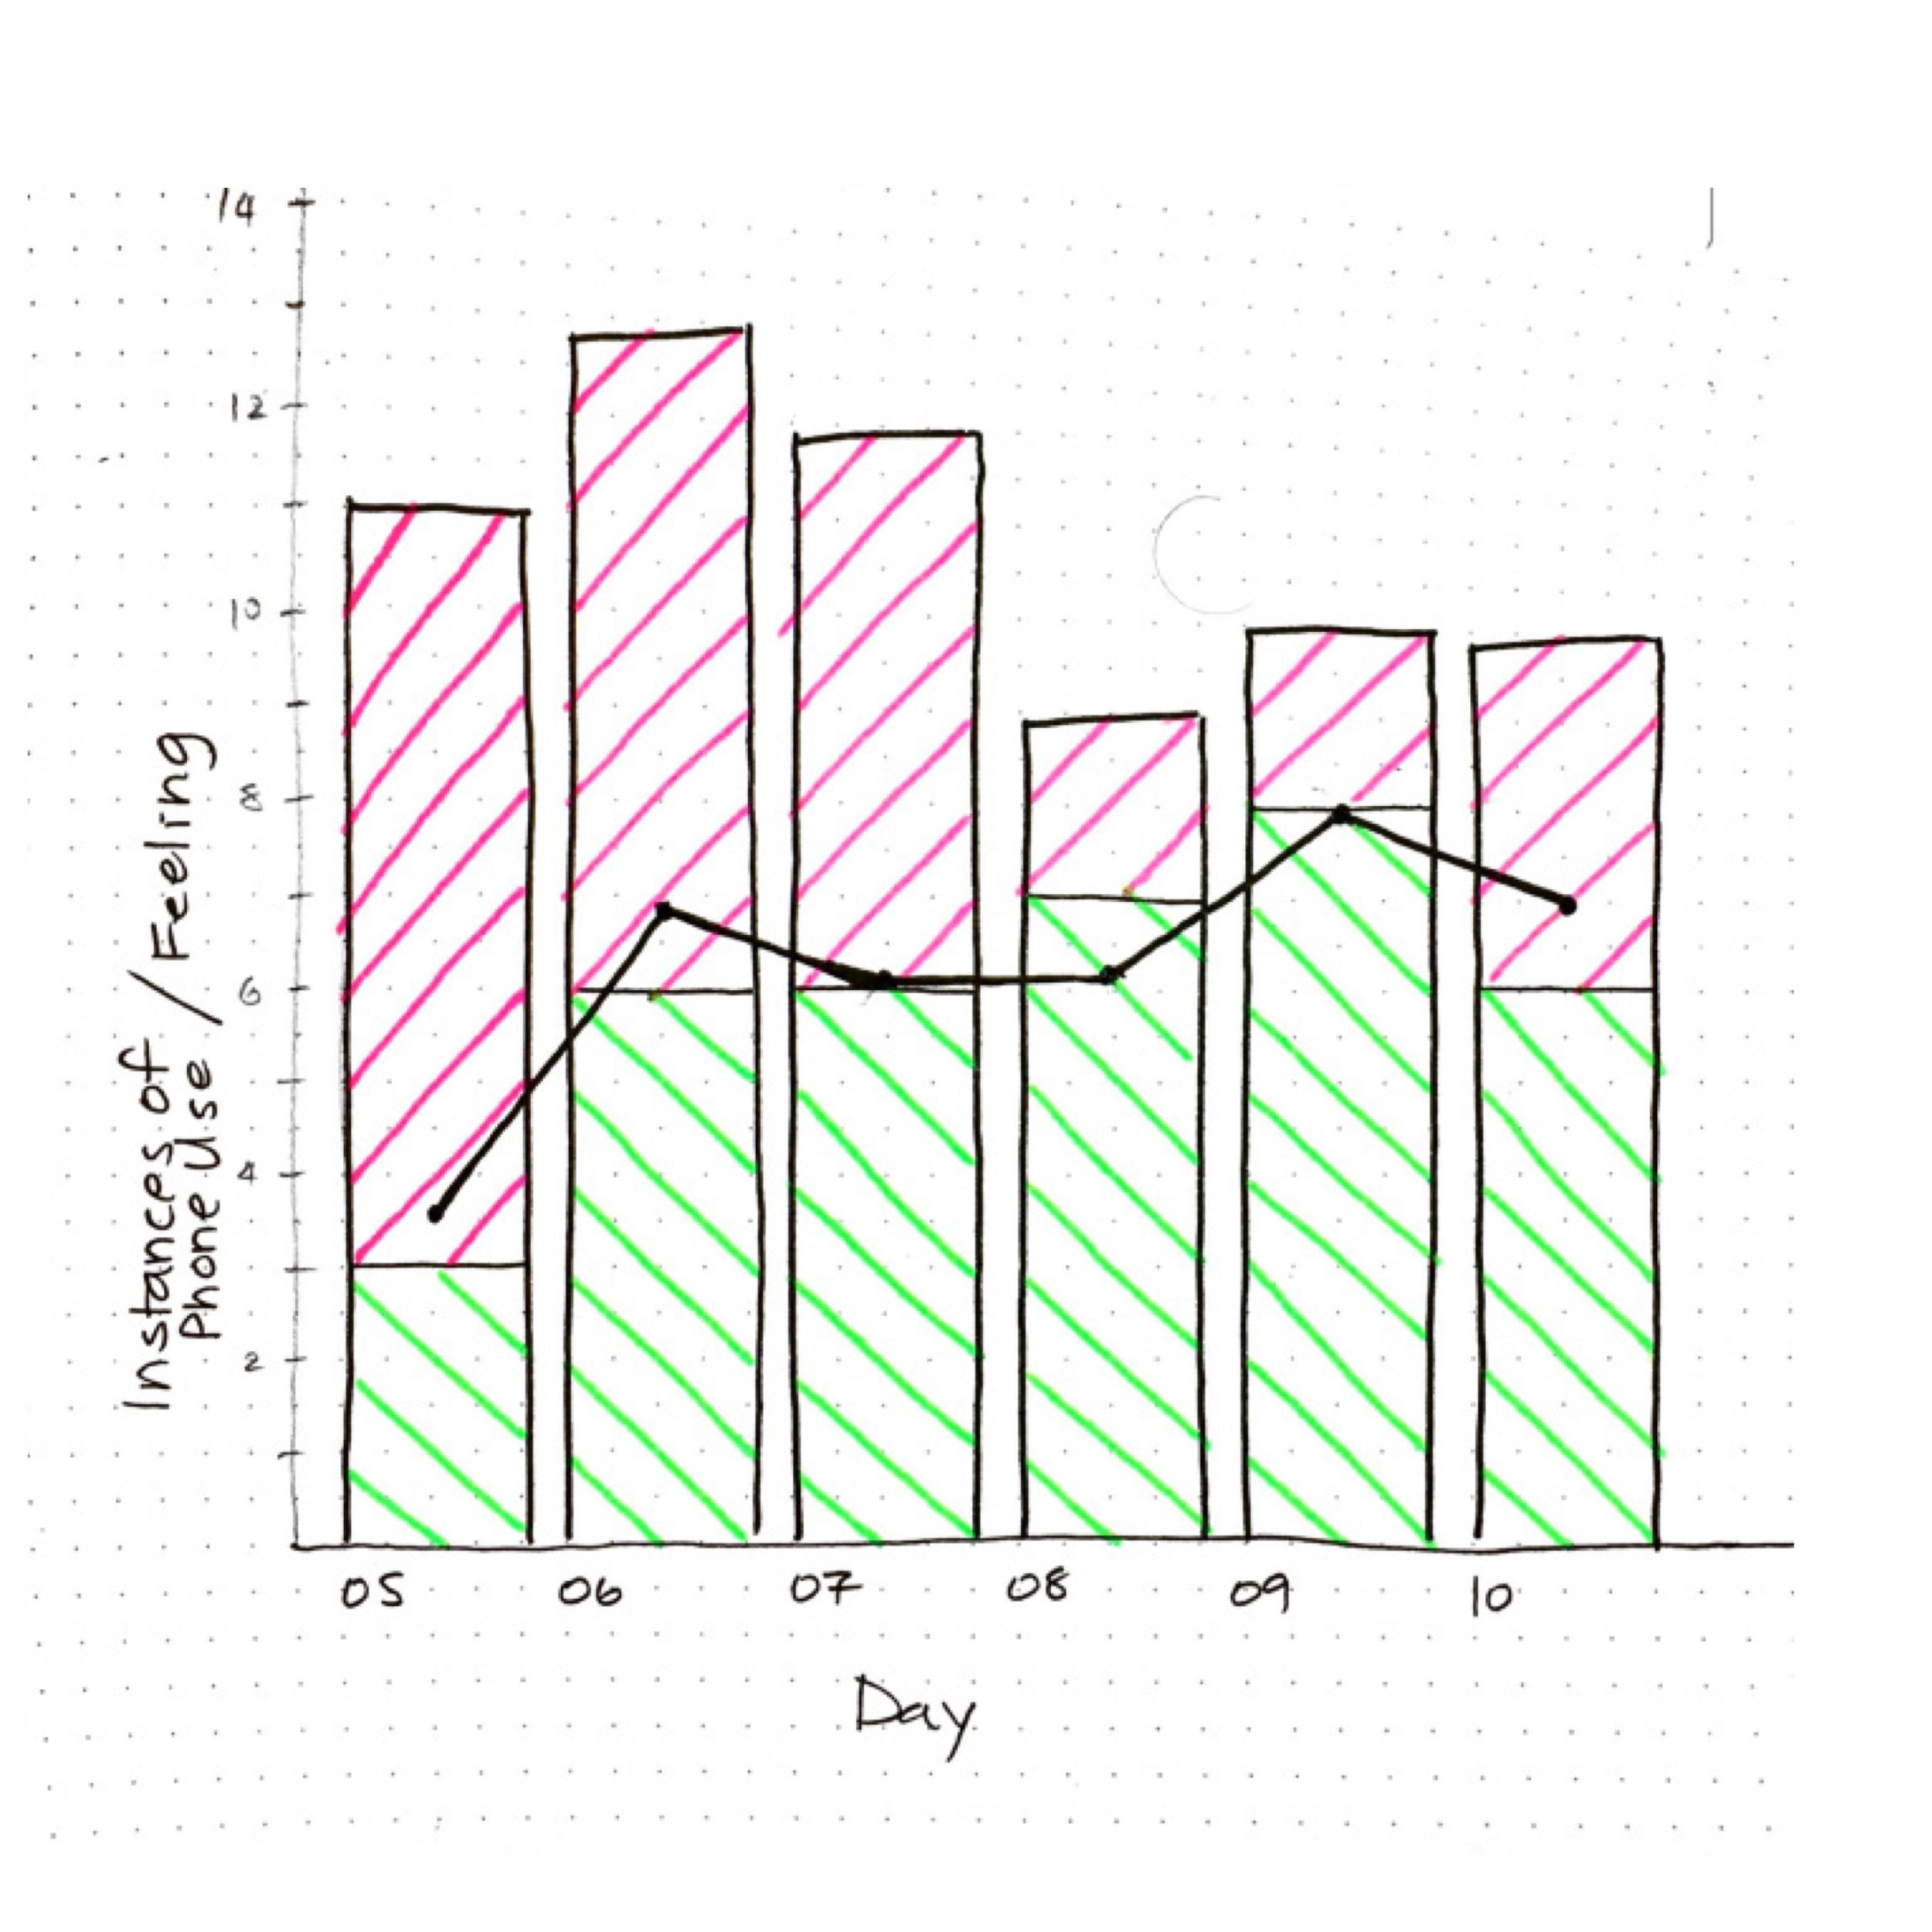 spotify_datavis-sketch-5.png